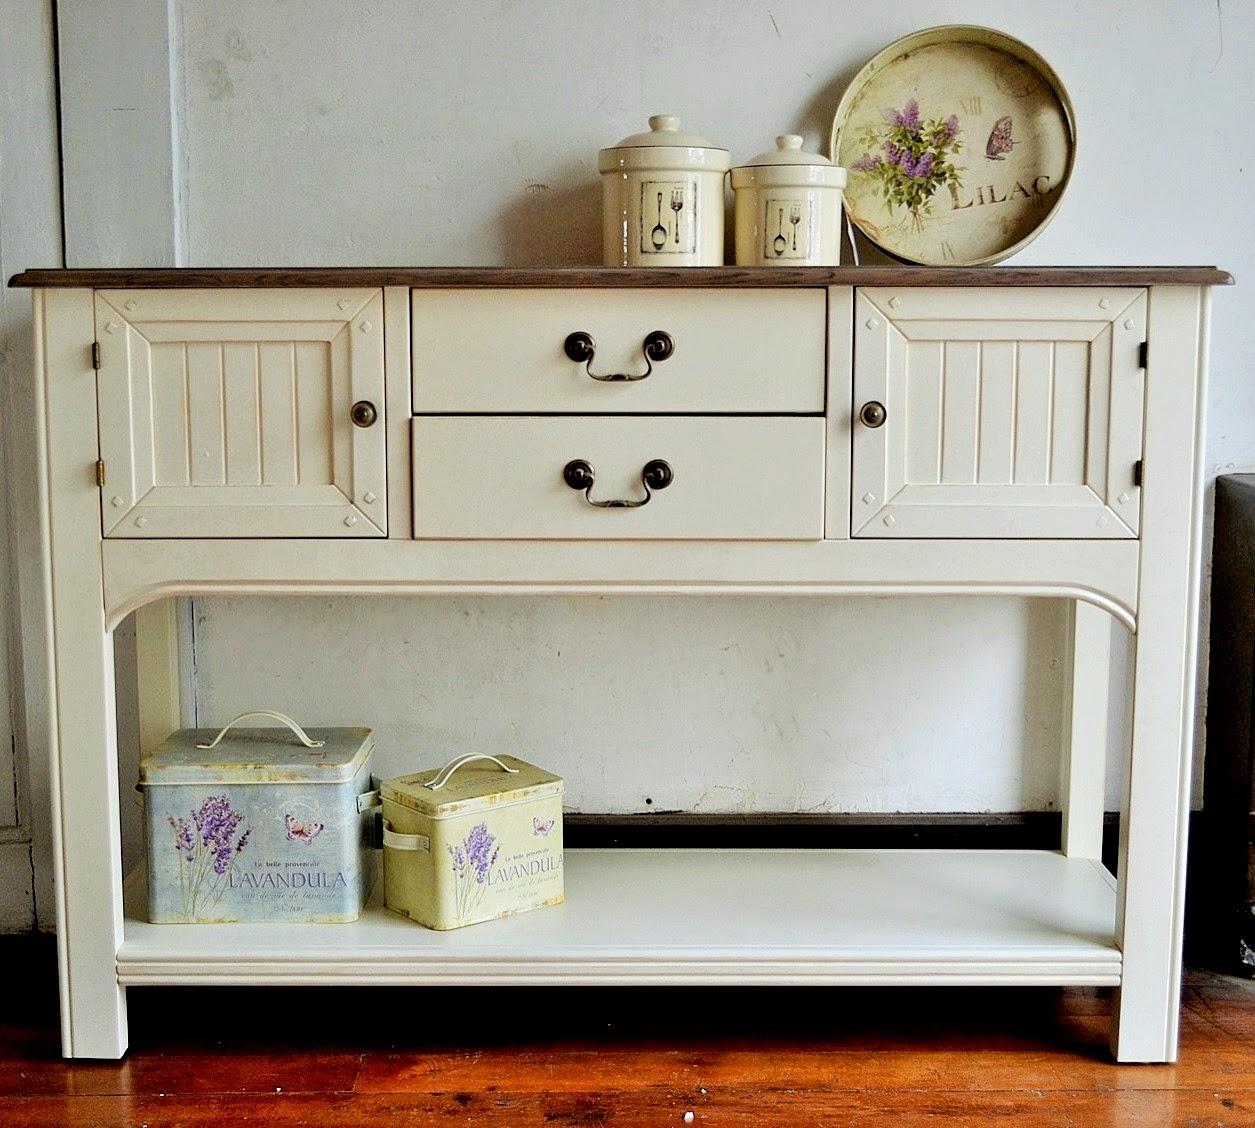 Paz montealegre decoraci n nueva linea de muebles provenzal for Muebles provenzales